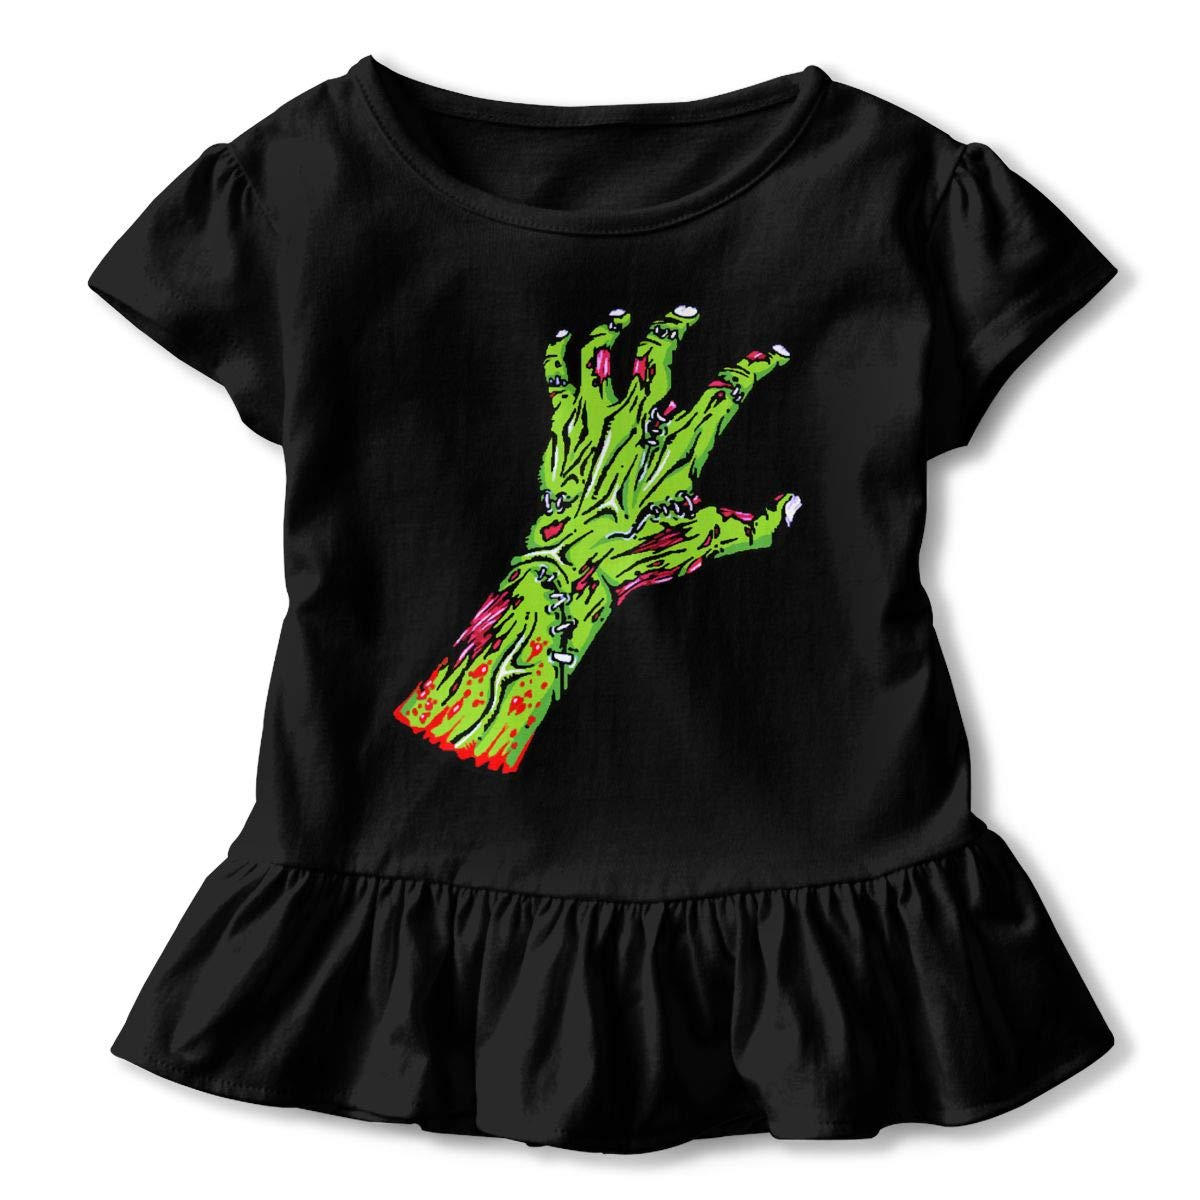 CZnuen Green Zombie Hand 2-6T Baby Girls Cotton Jersey Short Sleeve Ruffle Tee